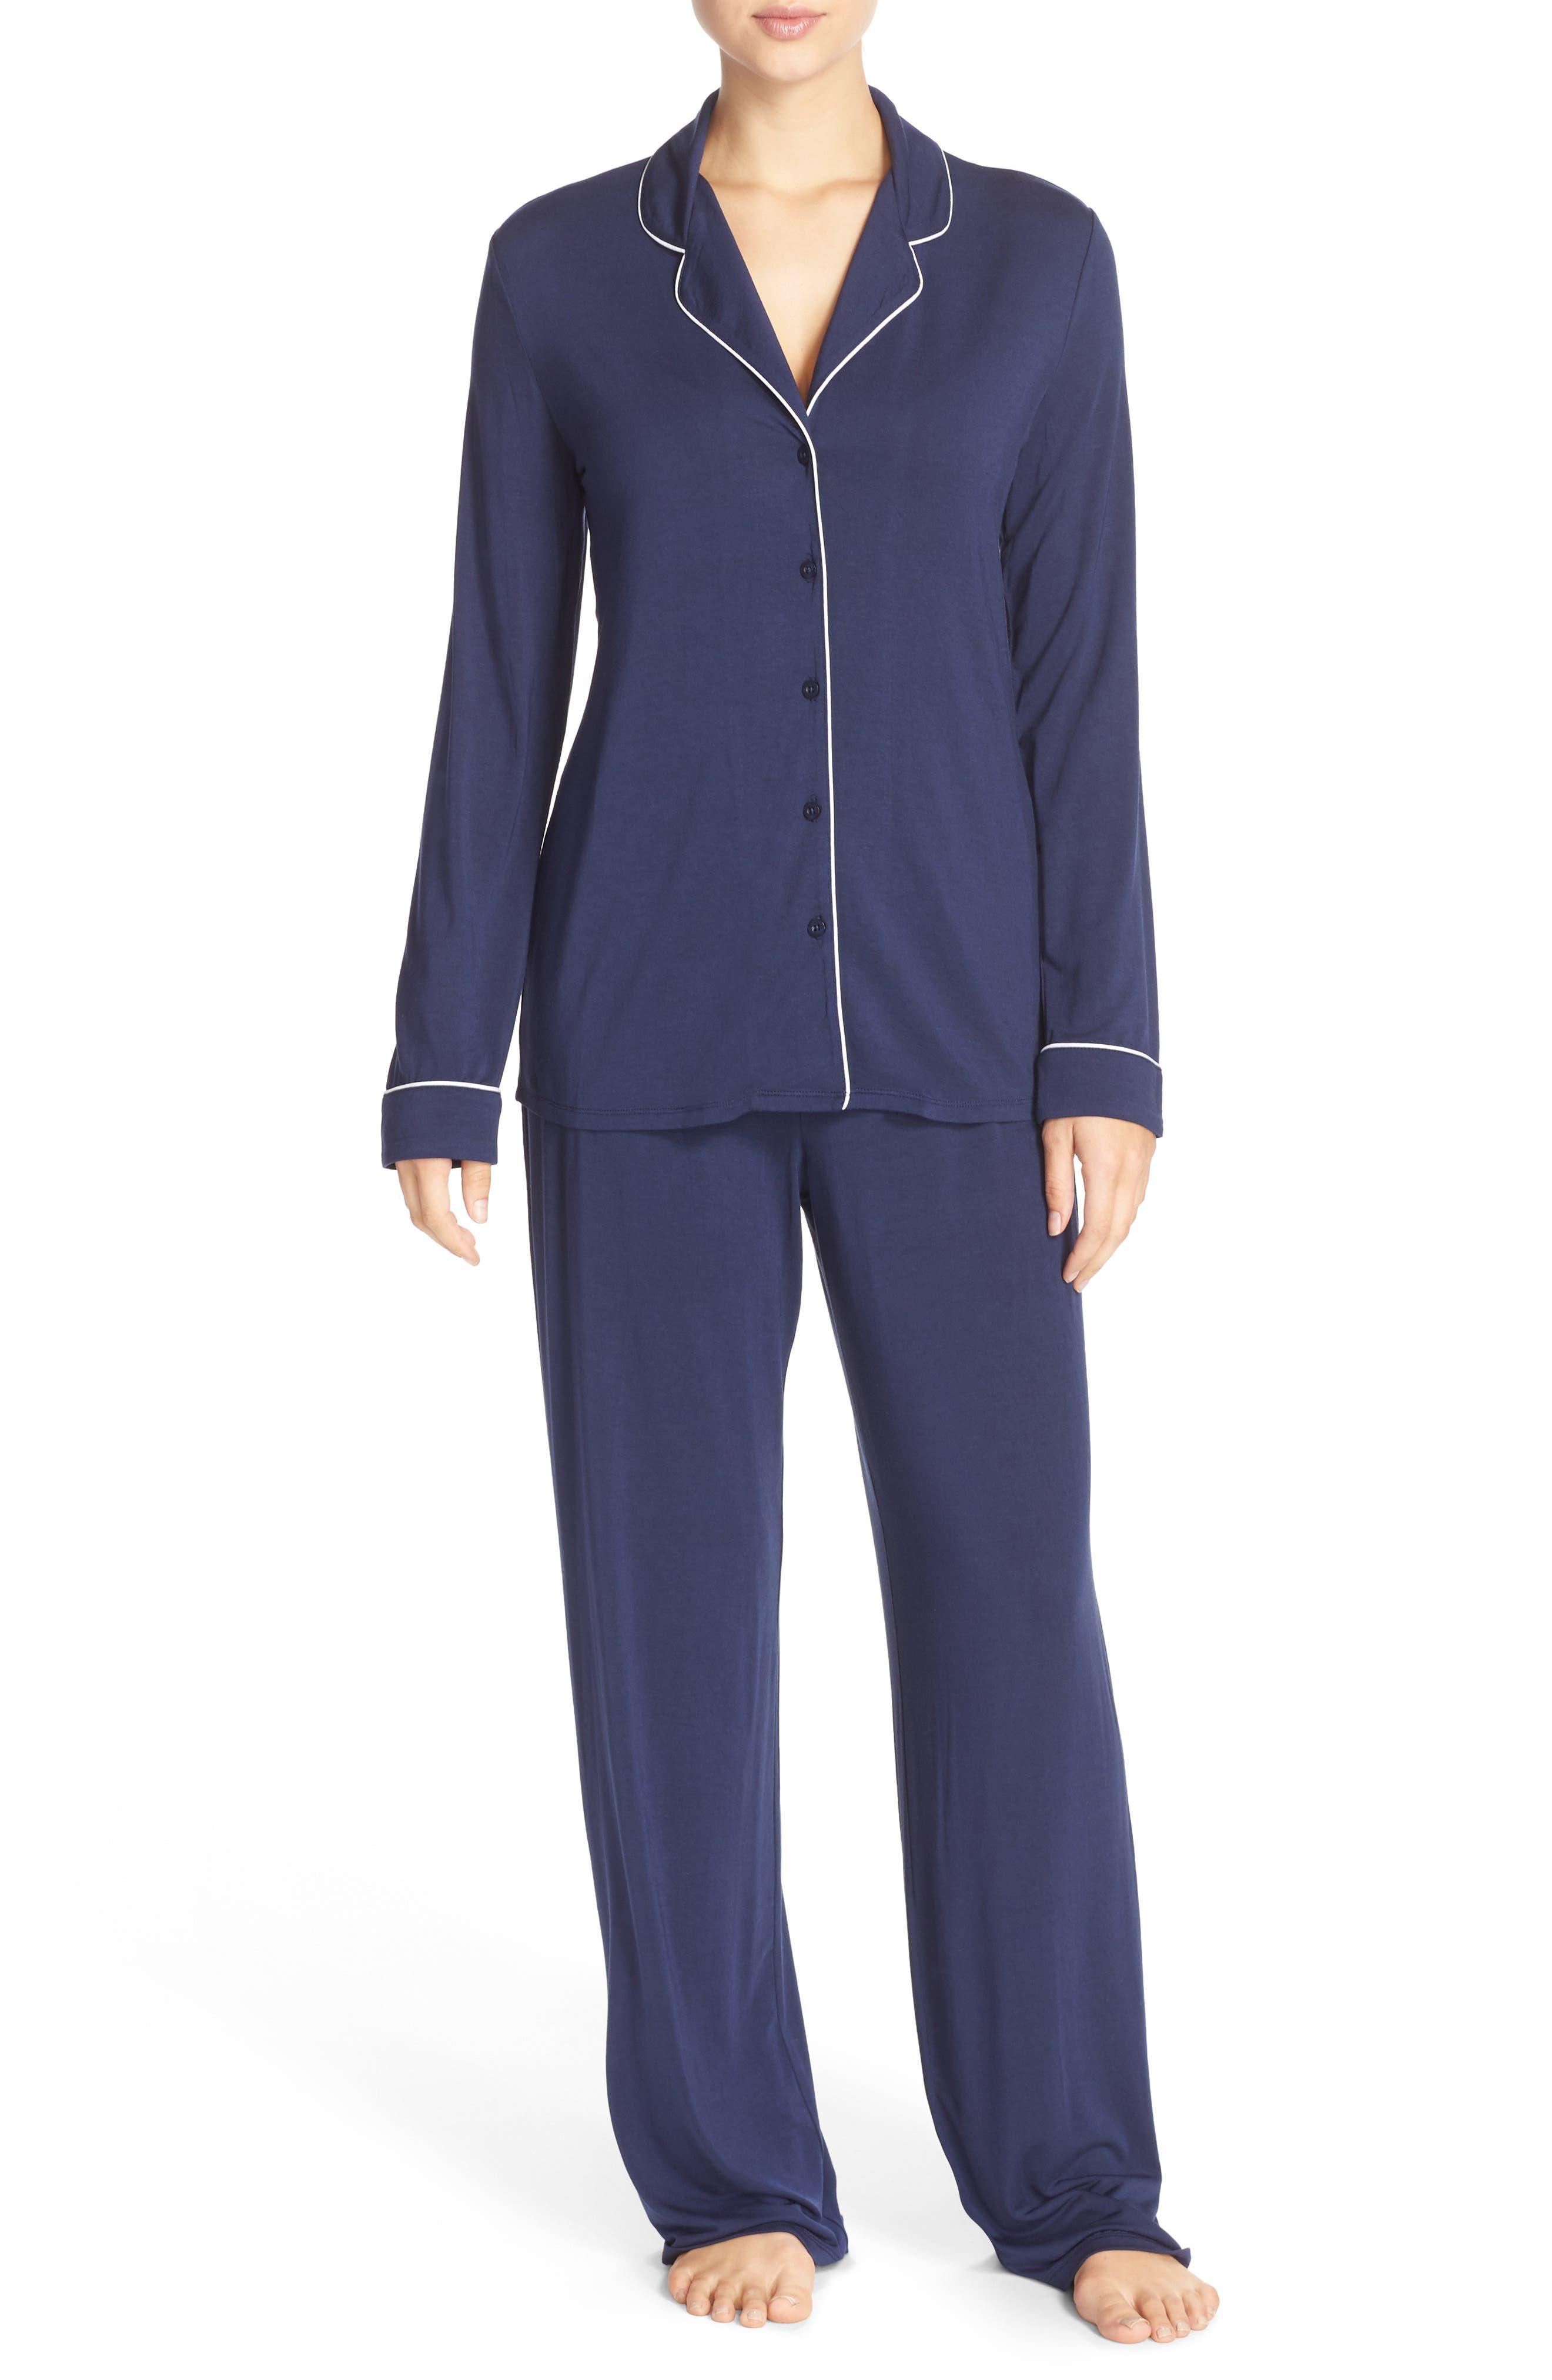 Moonlight Pajamas,                             Main thumbnail 1, color,                             Navy Peacoat